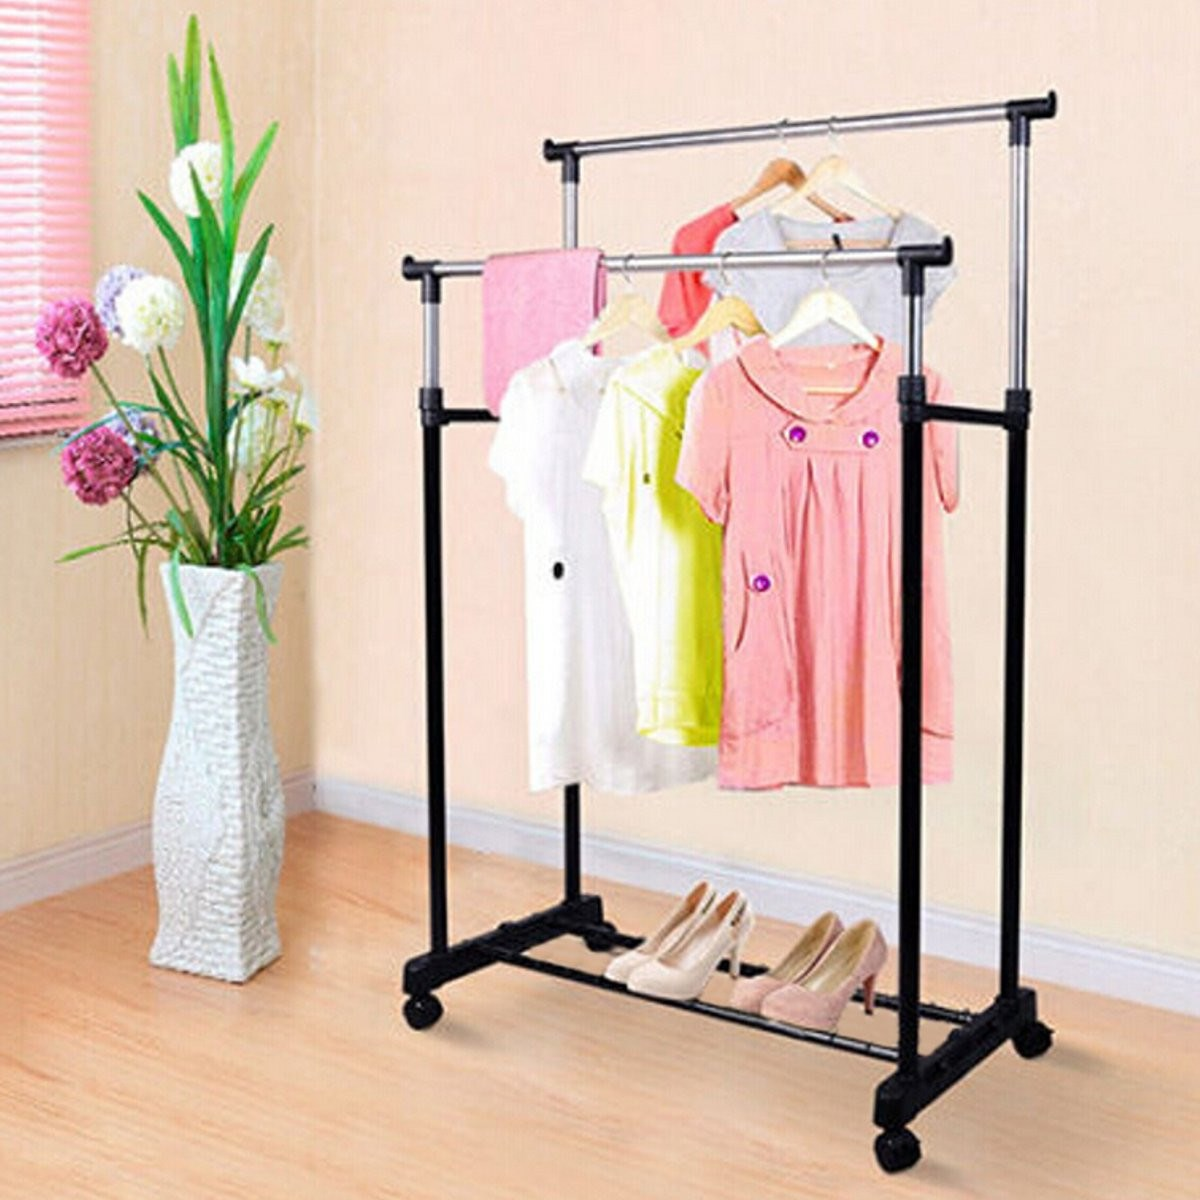 Cloth hanger stand online